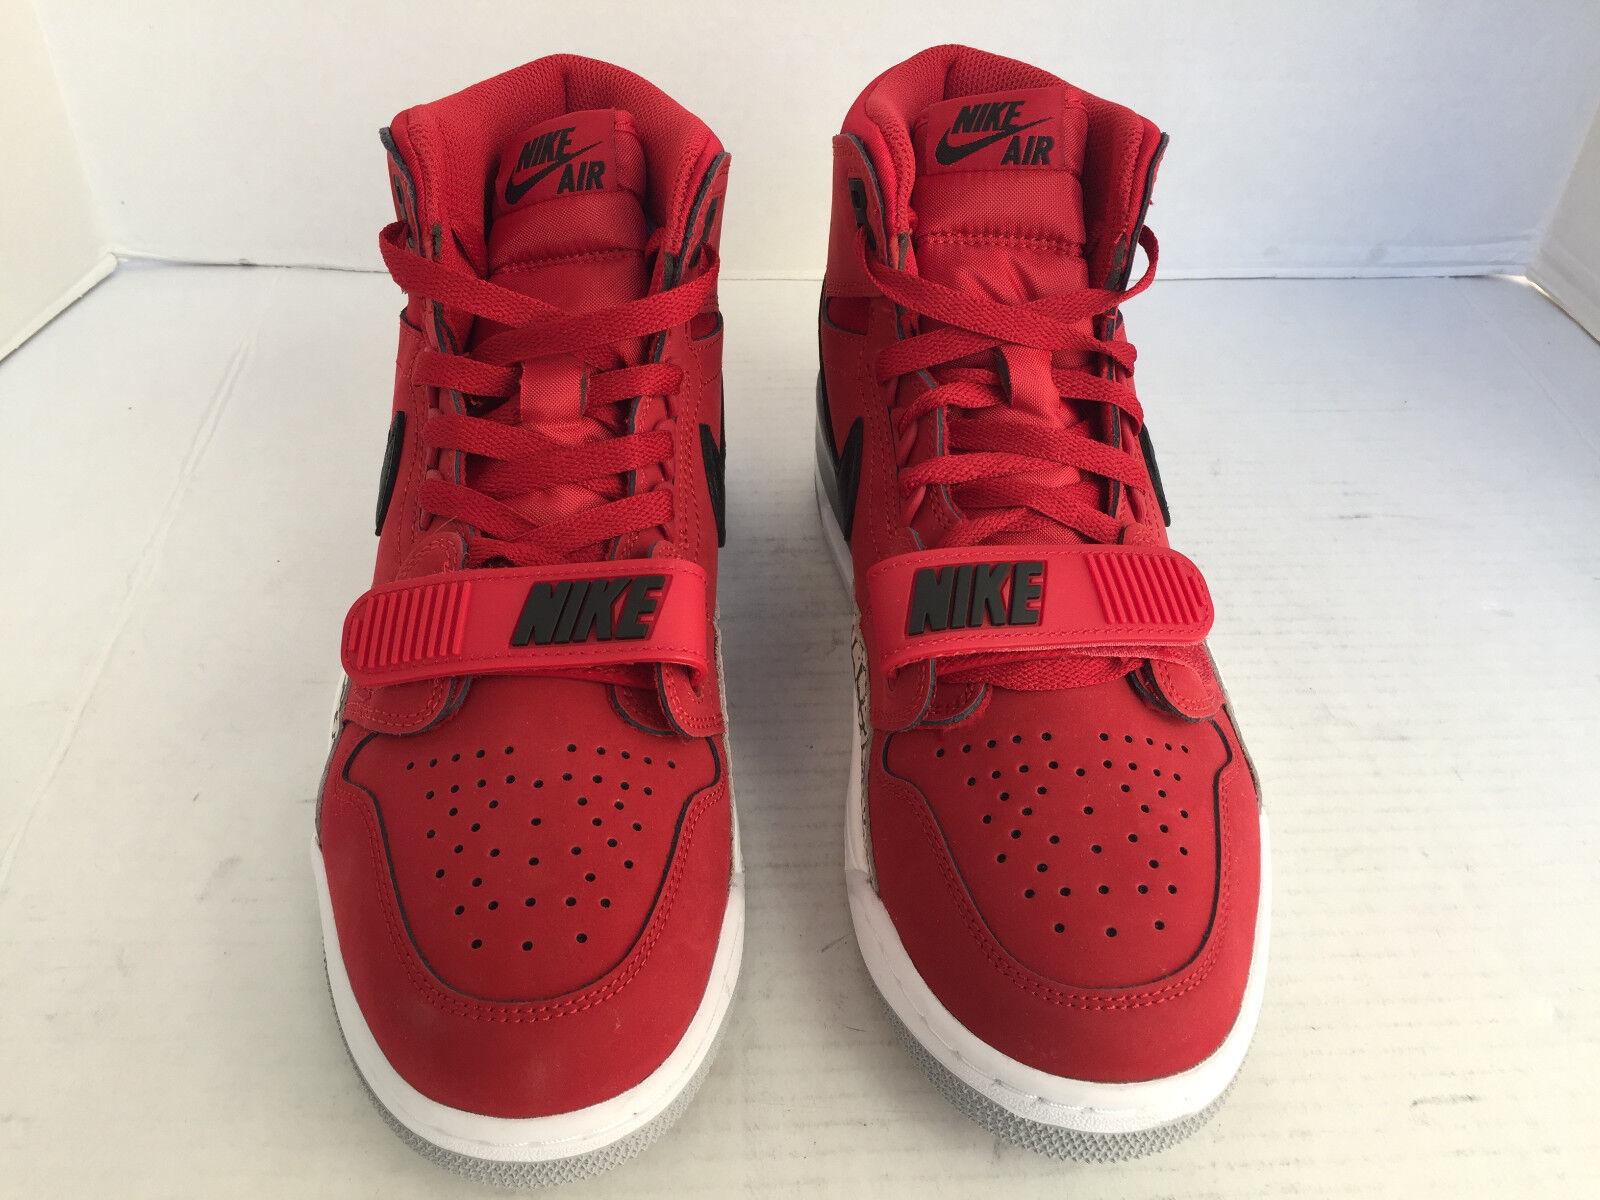 Nike Air Jordan Legacy 312 Tgold Varsity Red Black lot AV3922 601 Mens Size 9